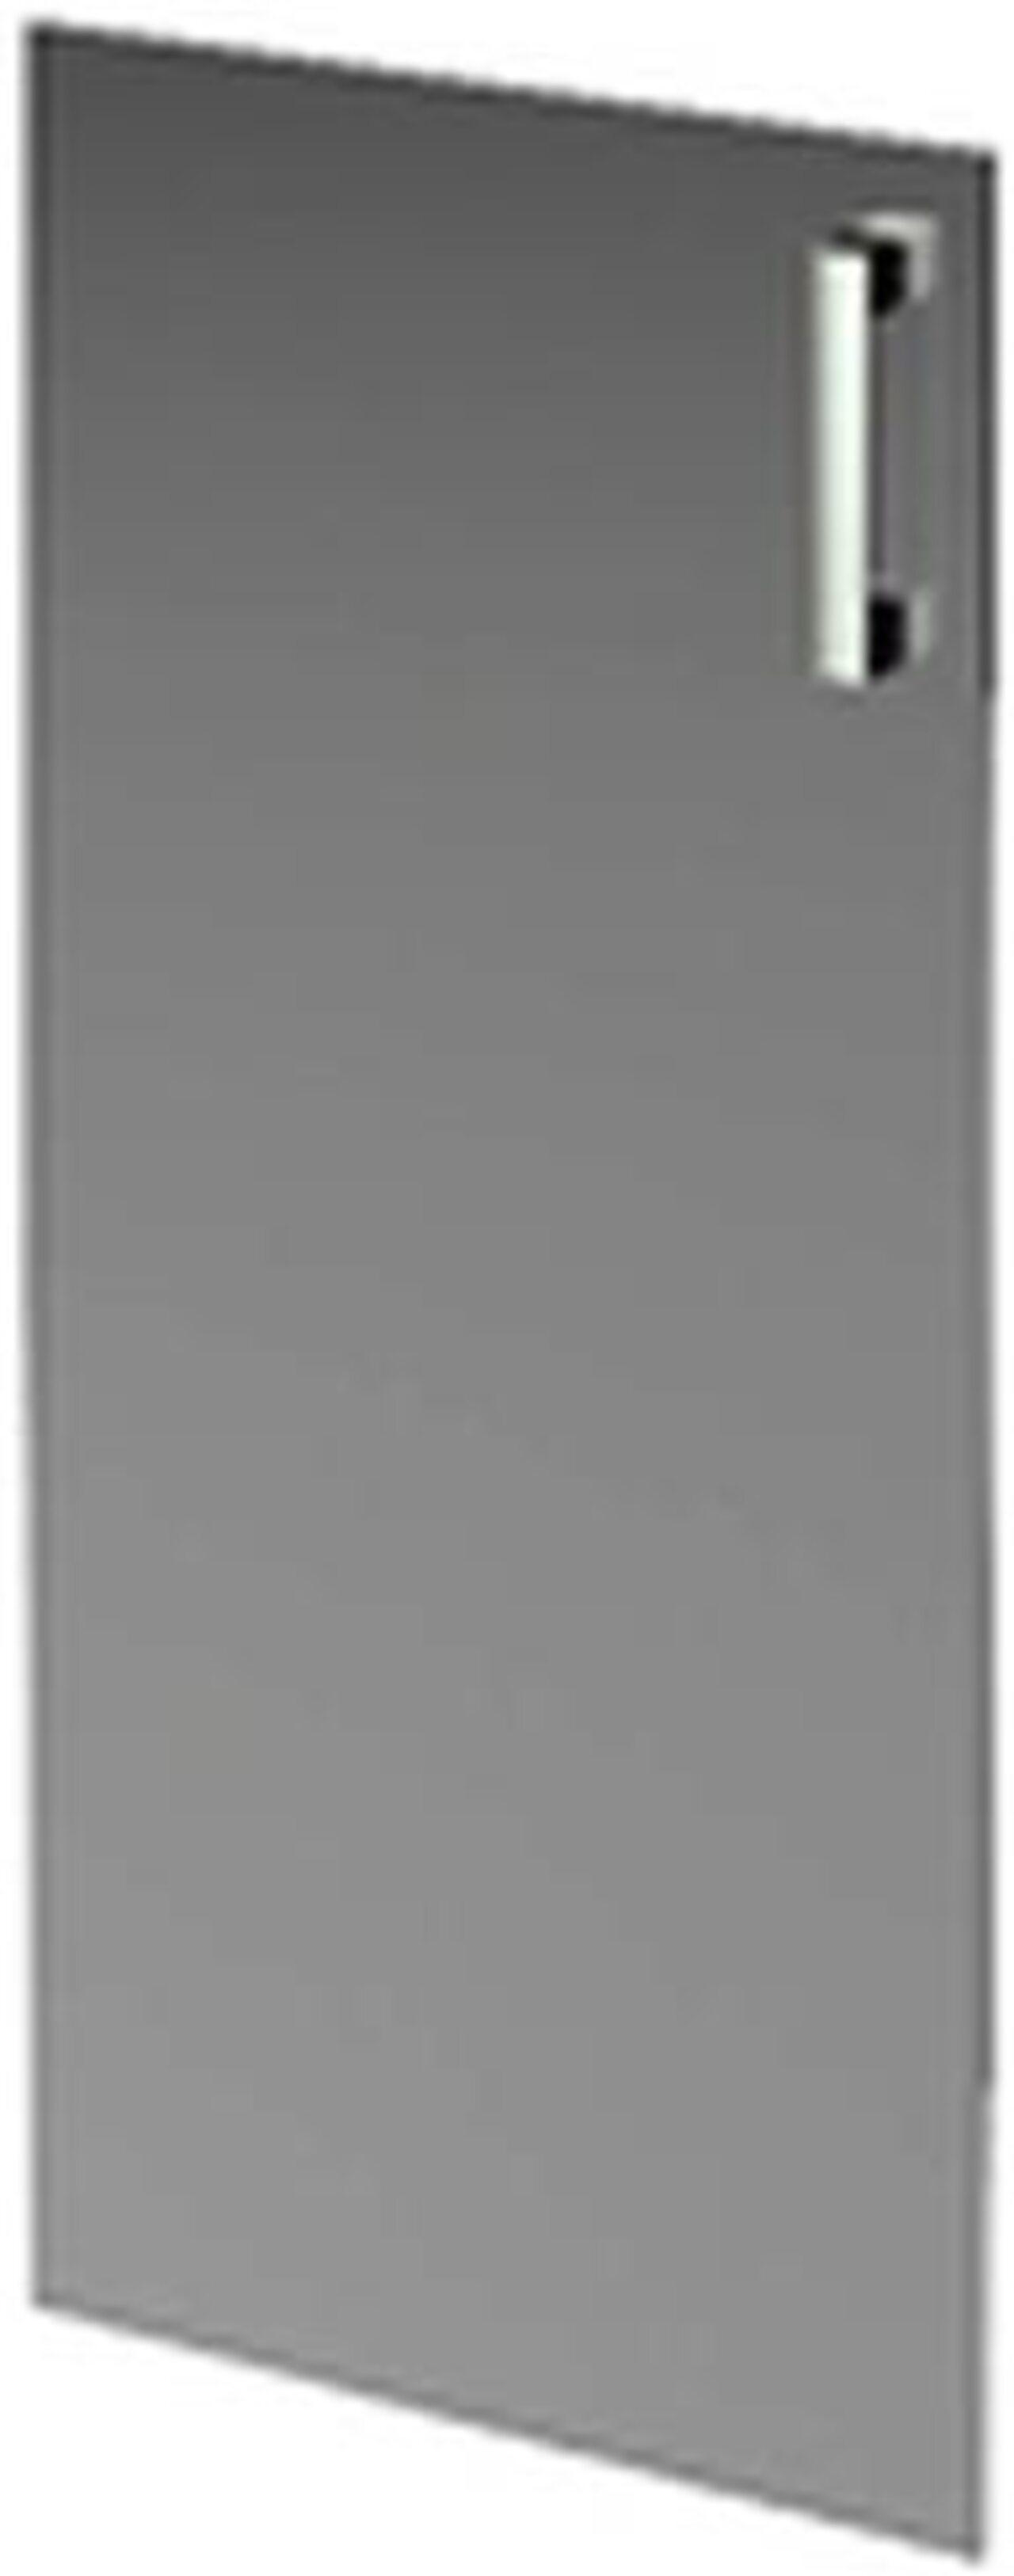 Дверь средняя стеклянная  Аргентум 39x1x118 - фото 5